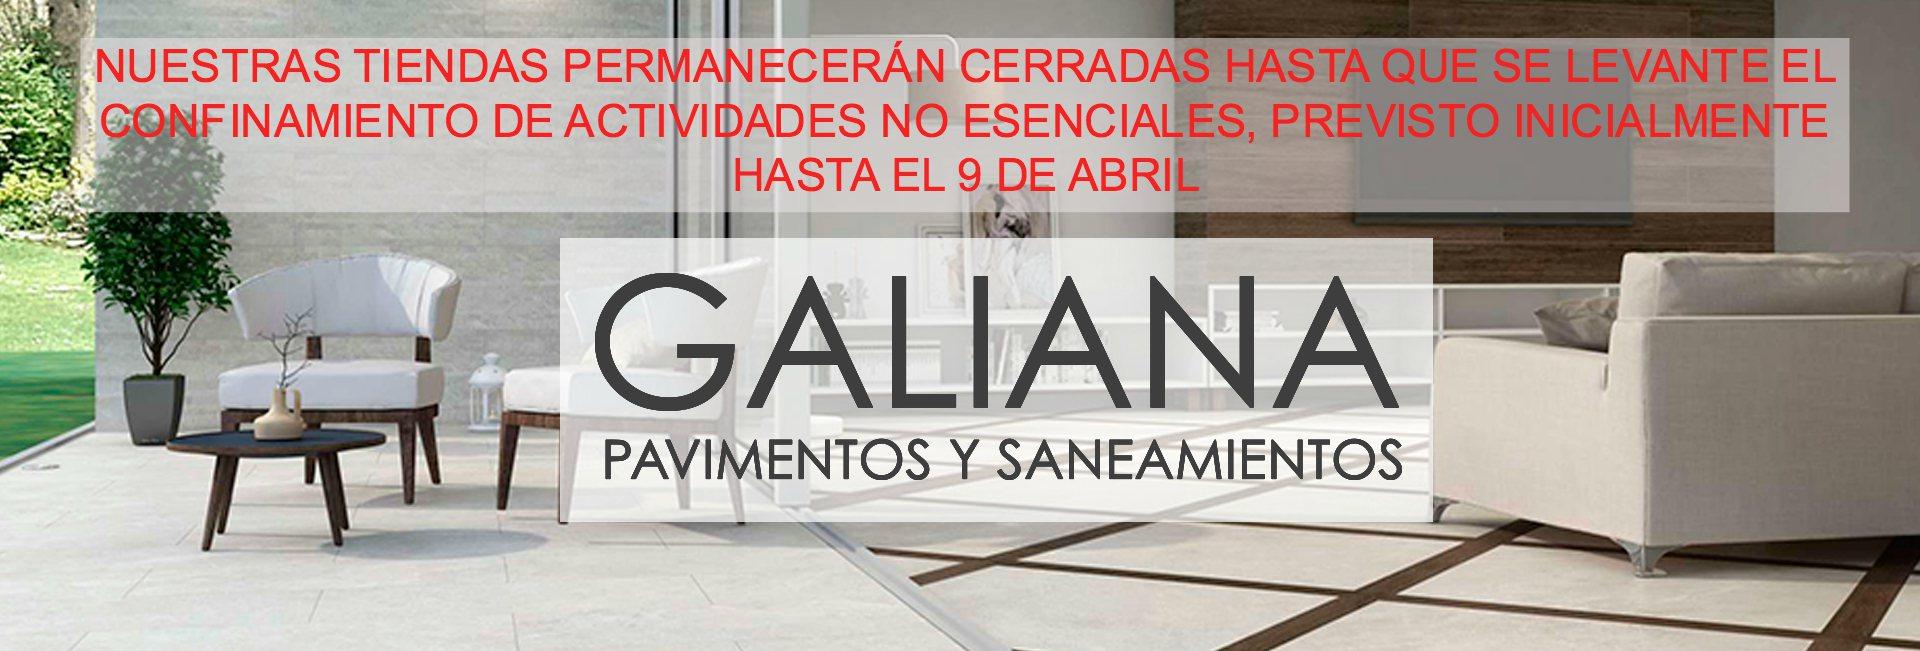 GALIANA Coronavirus 9 abril